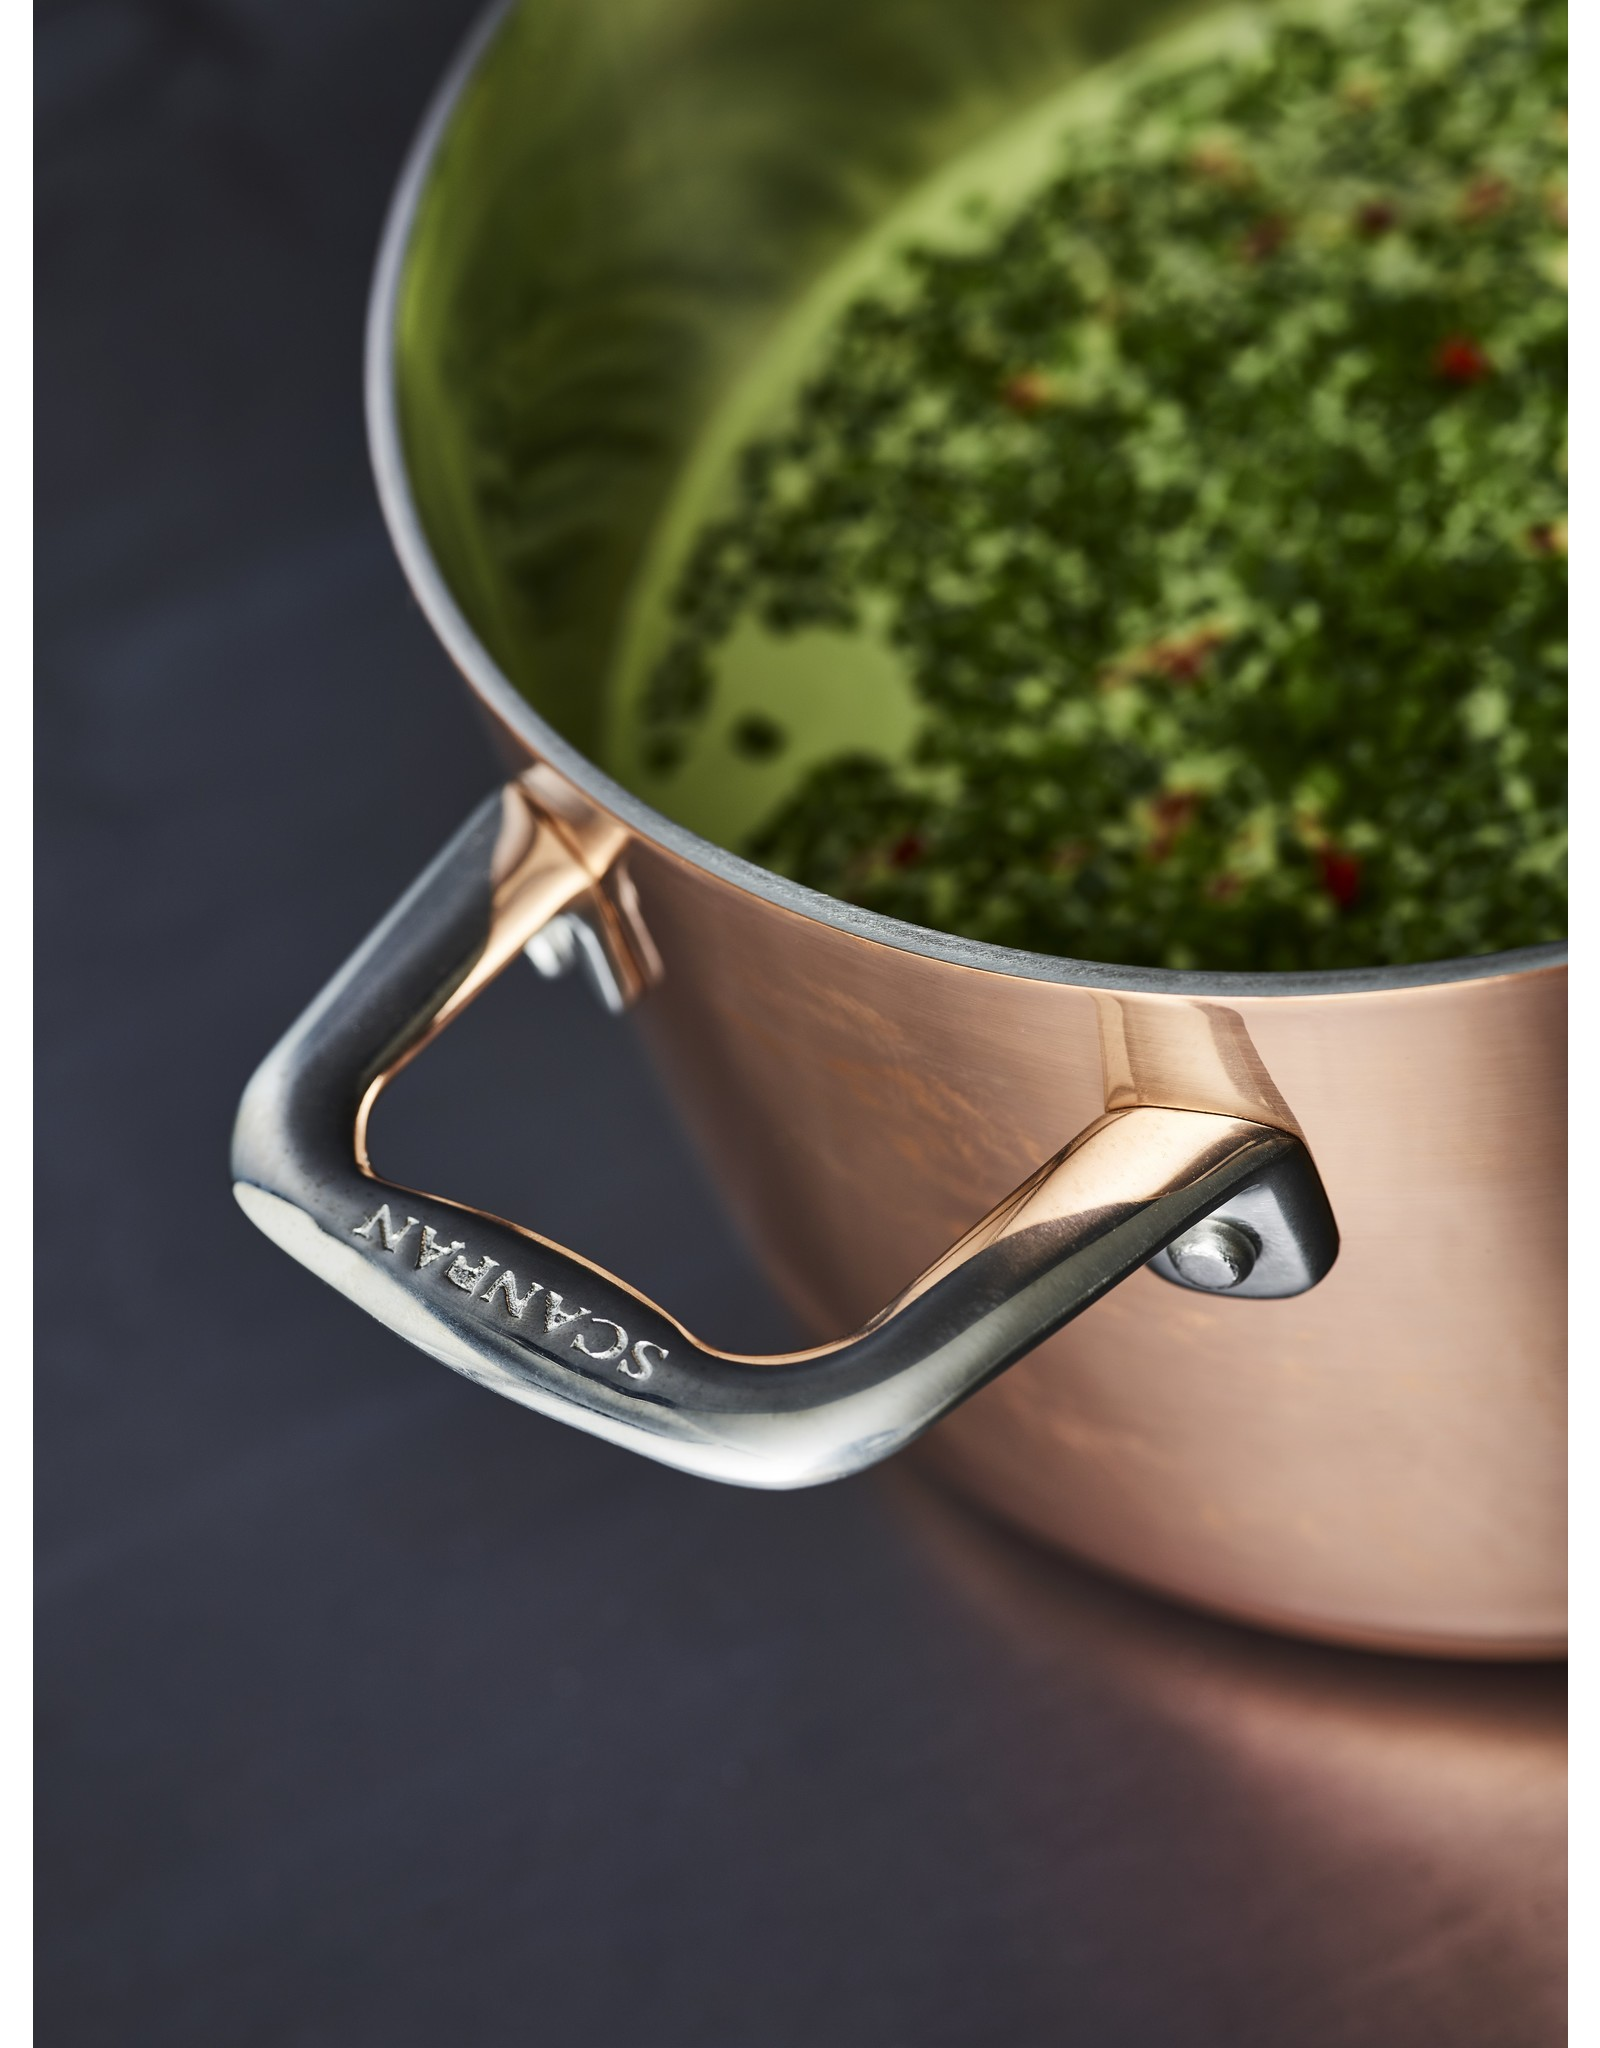 Scanpan Maitré D'  kook/braadpan 20 cm 3,5L inductie